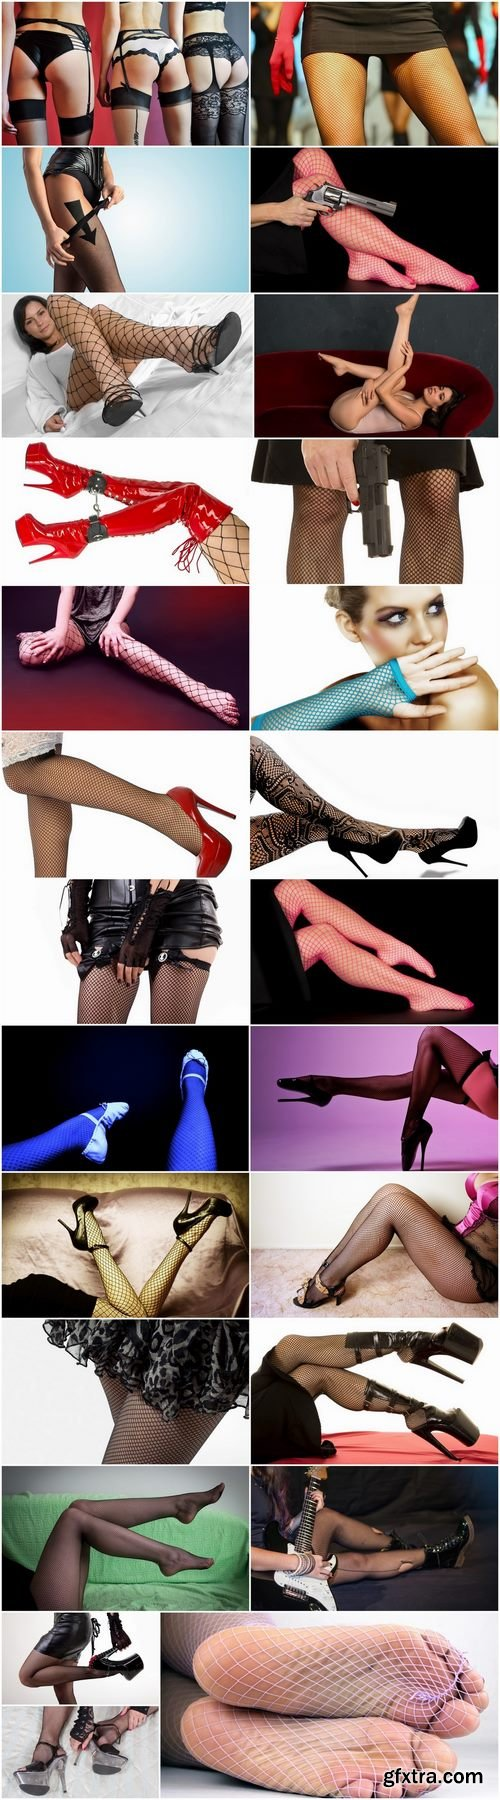 Woman girl in stockings pantyhose Beautiful female legs 25 HQ Jpeg